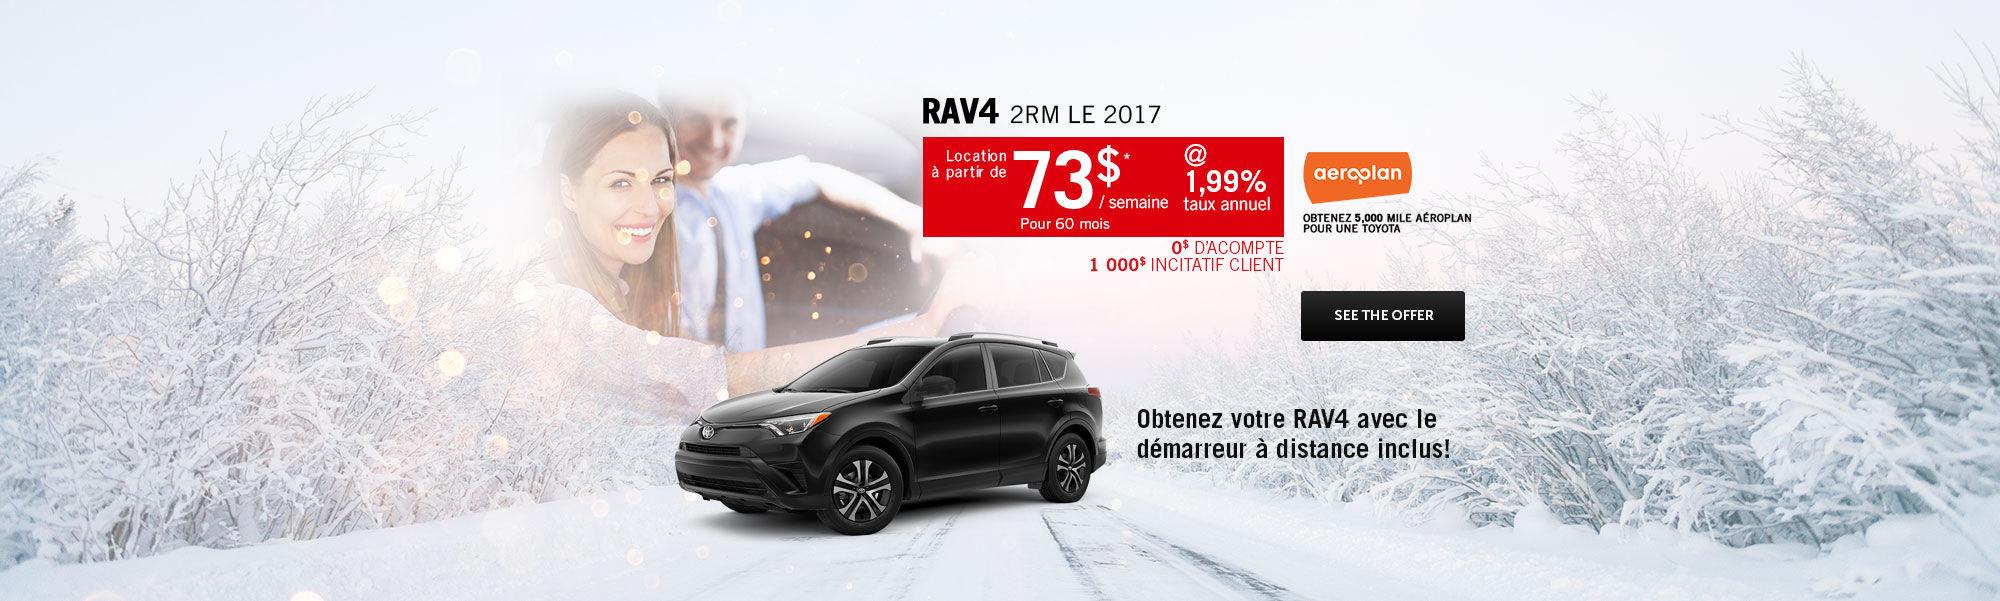 Saison des choix sensés - Rav4